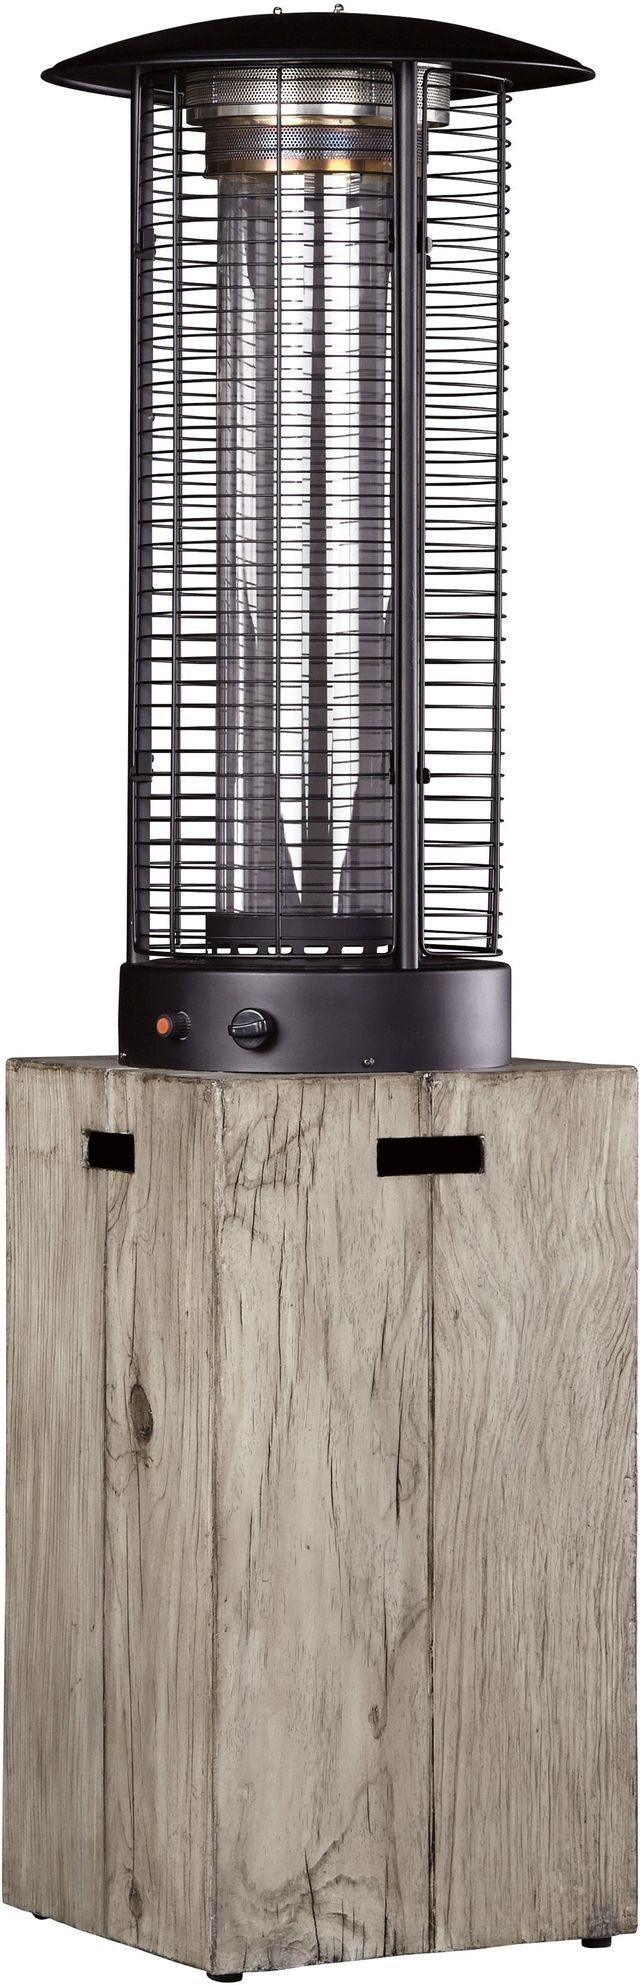 Signature Design by Ashley® Peachstone Patio Heater-P655-900